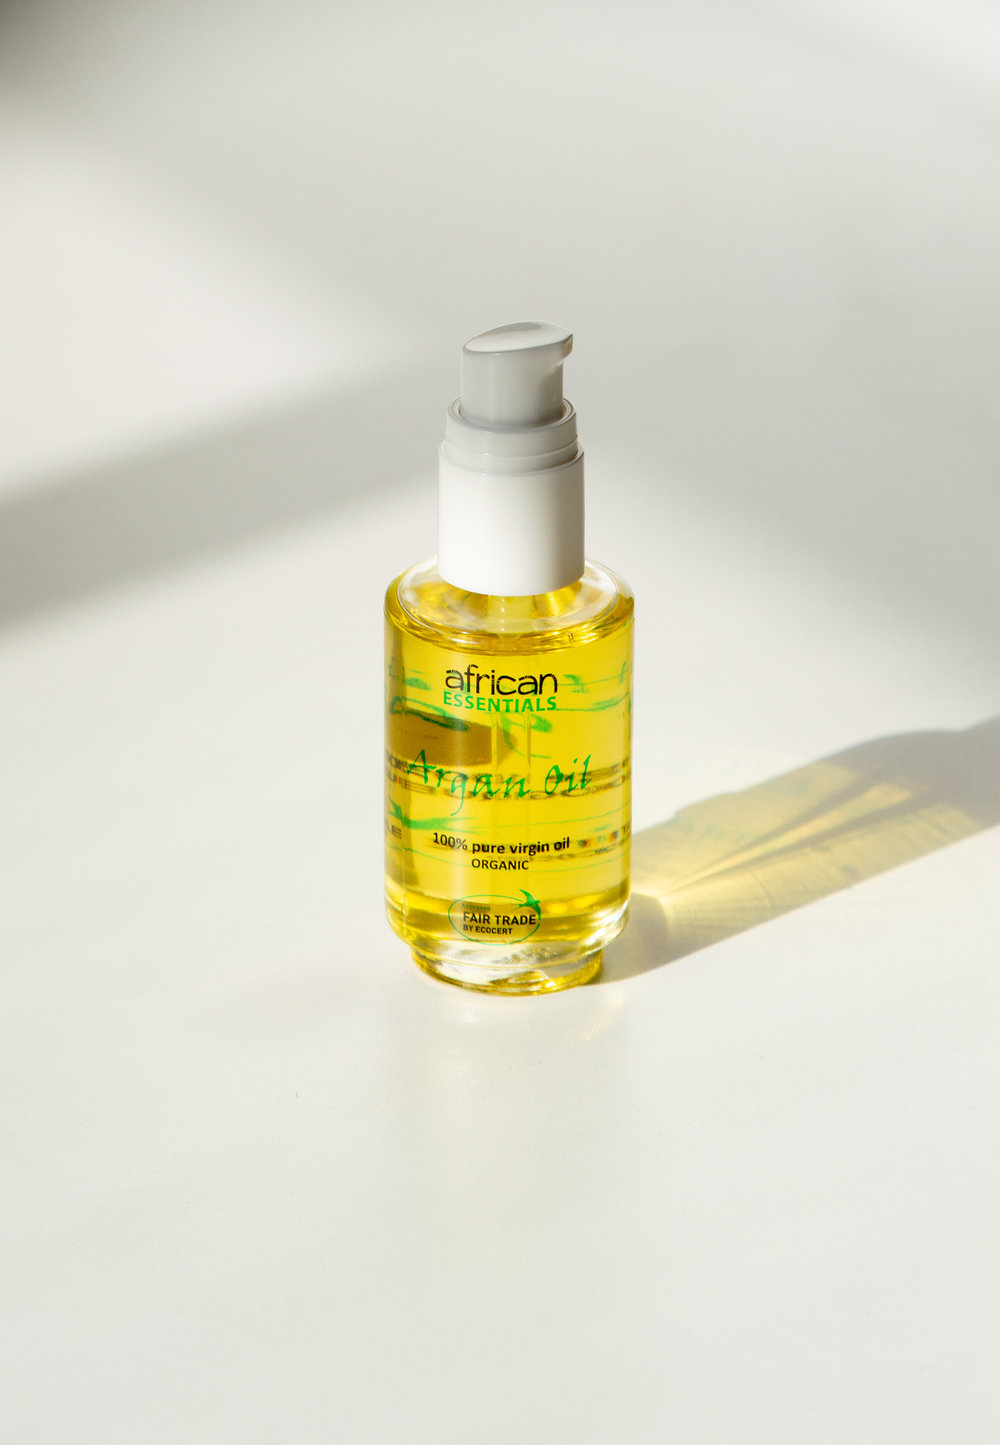 African Essentials Argan Oil Review